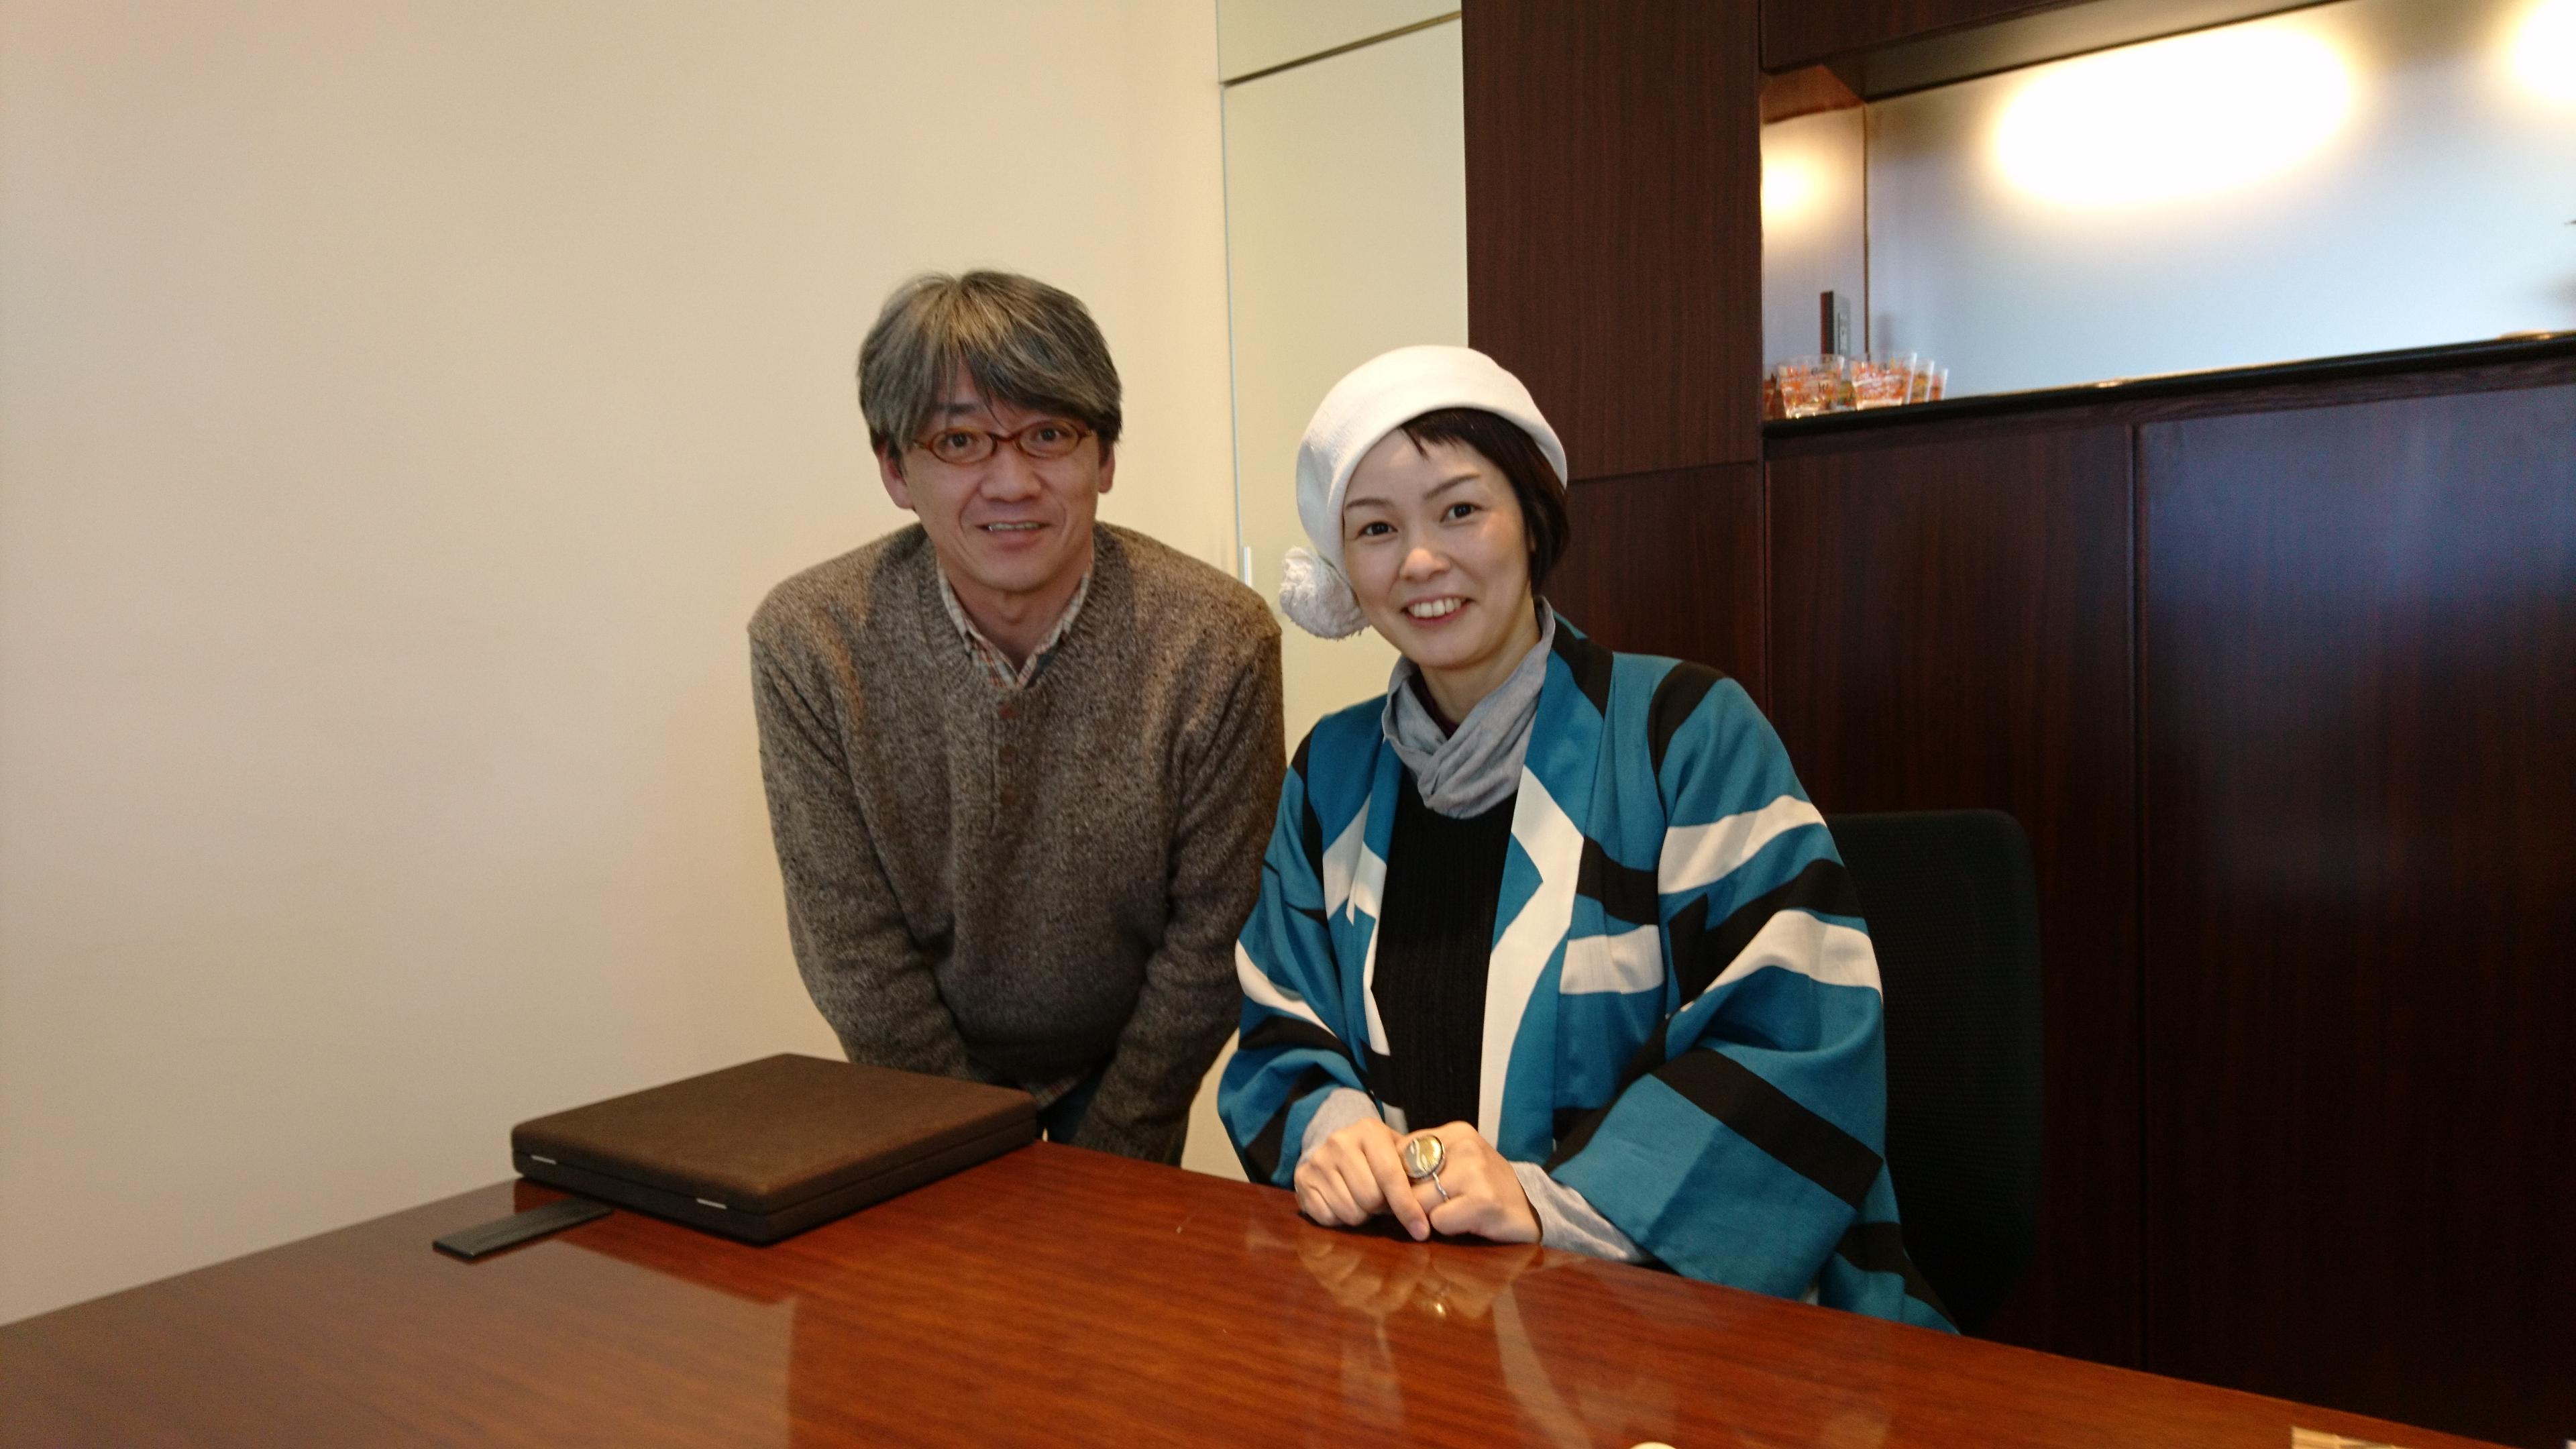 http://hashiguchi-seikotu.com/blog/about/DSC_0275.JPG